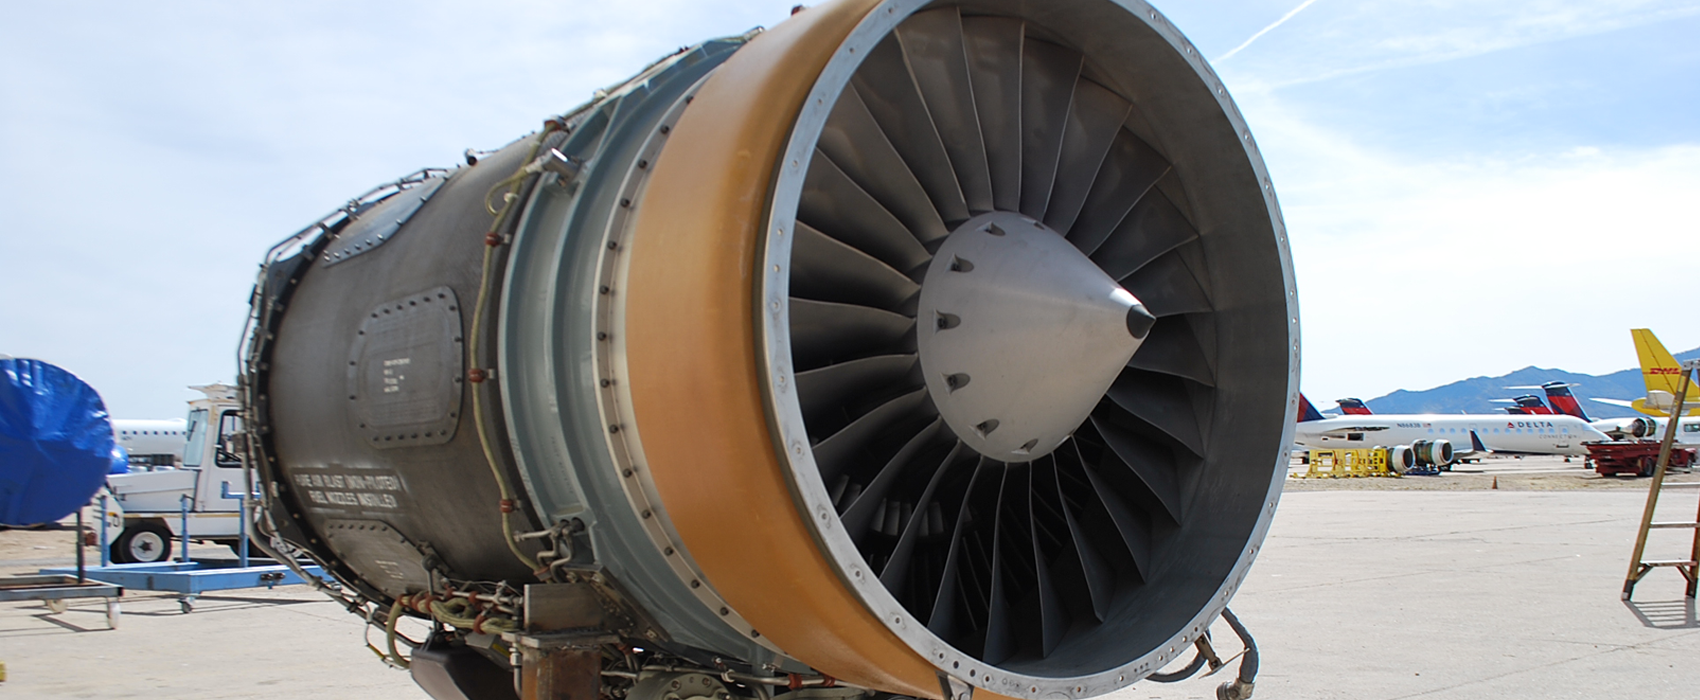 Kingman Aviation Parts Arizona Airport Airplane Tear Down